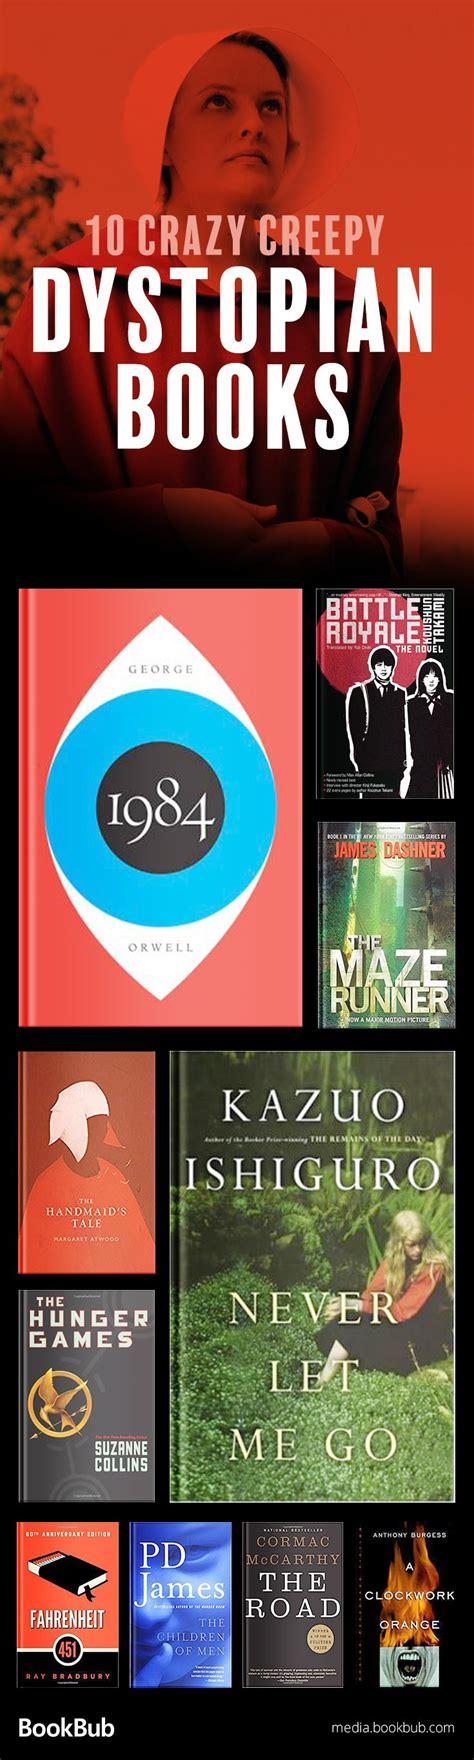 The 25+ best Love reading ideas on Pinterest   Reading ...